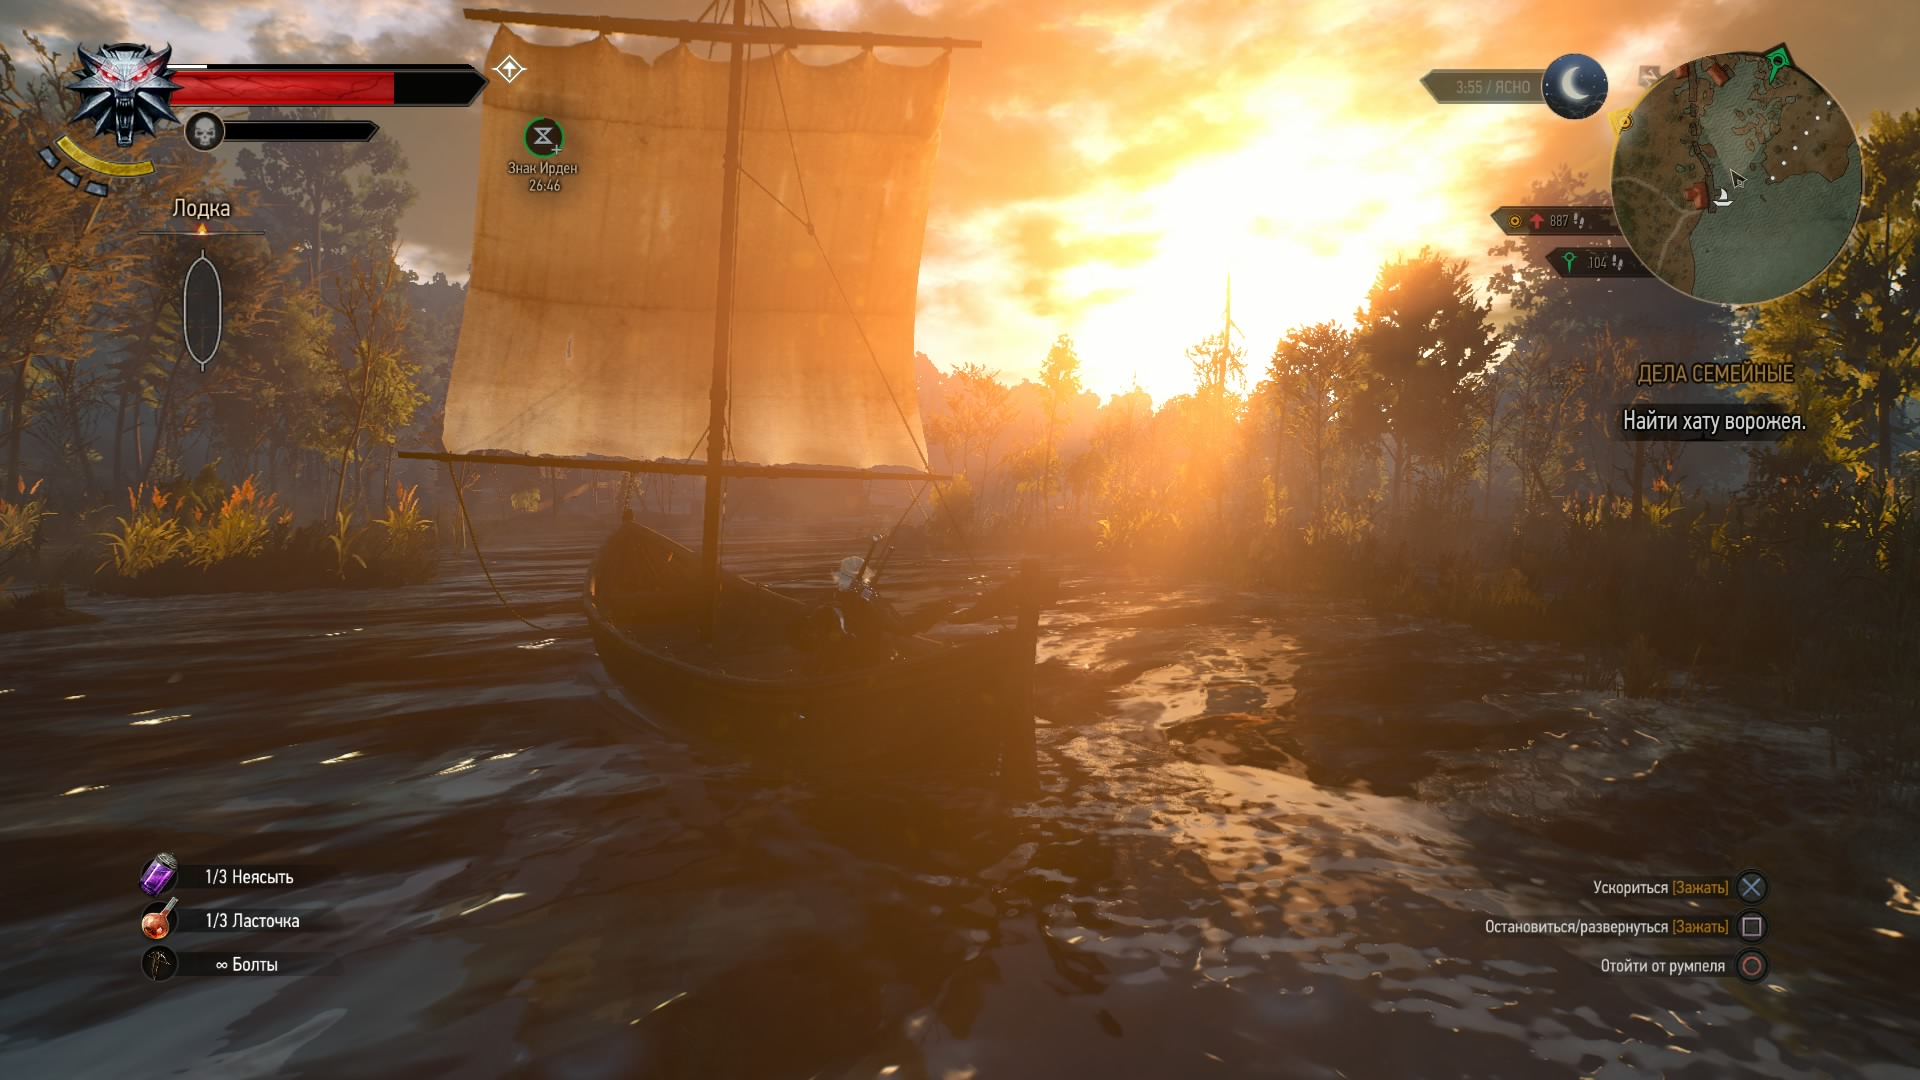 UolrygP.jpg - Witcher 3: Wild Hunt, the